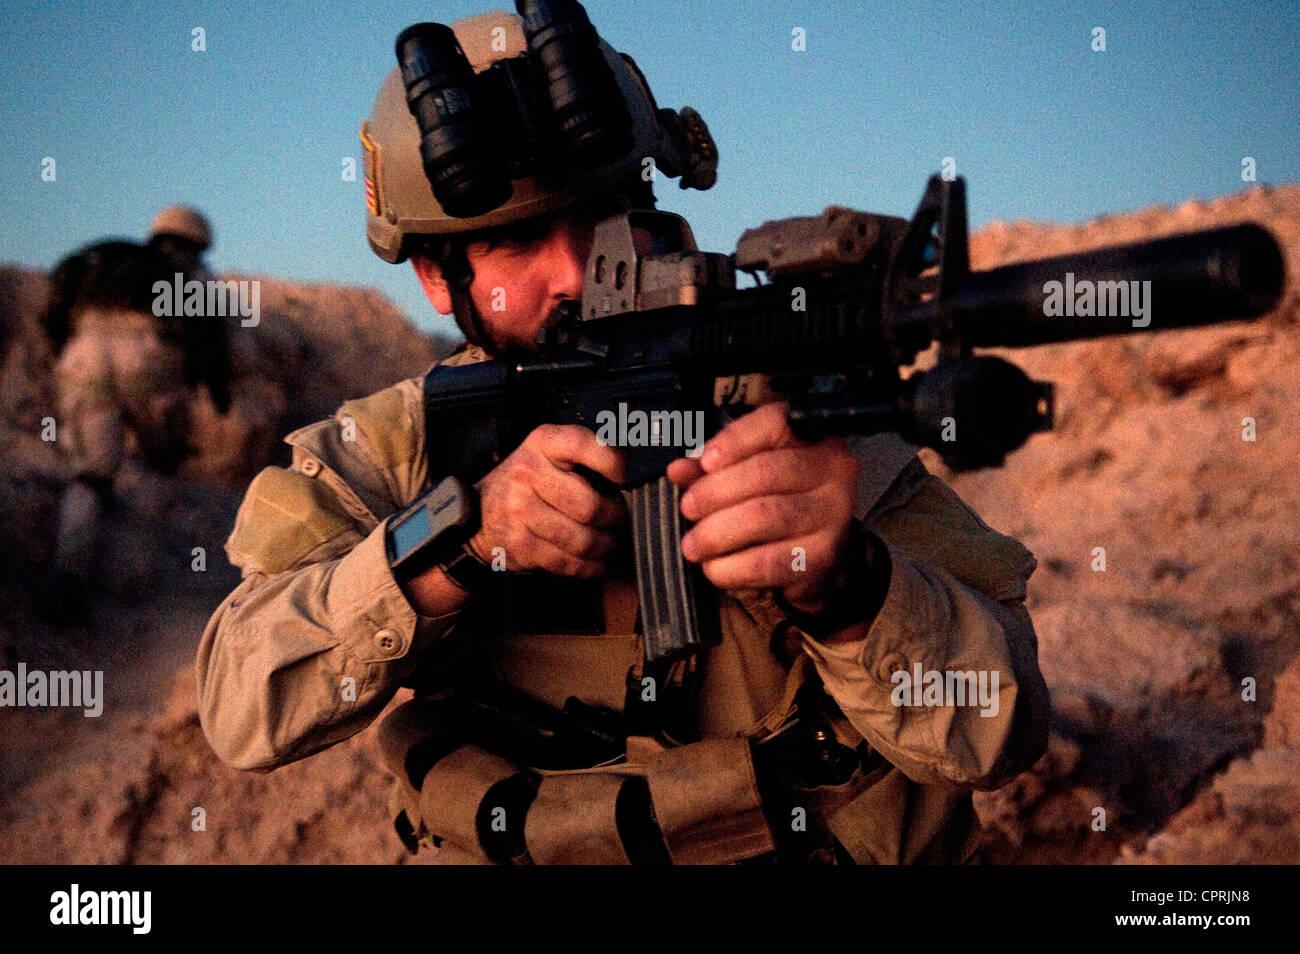 US Navy SEALs during desert combat training - Stock Image